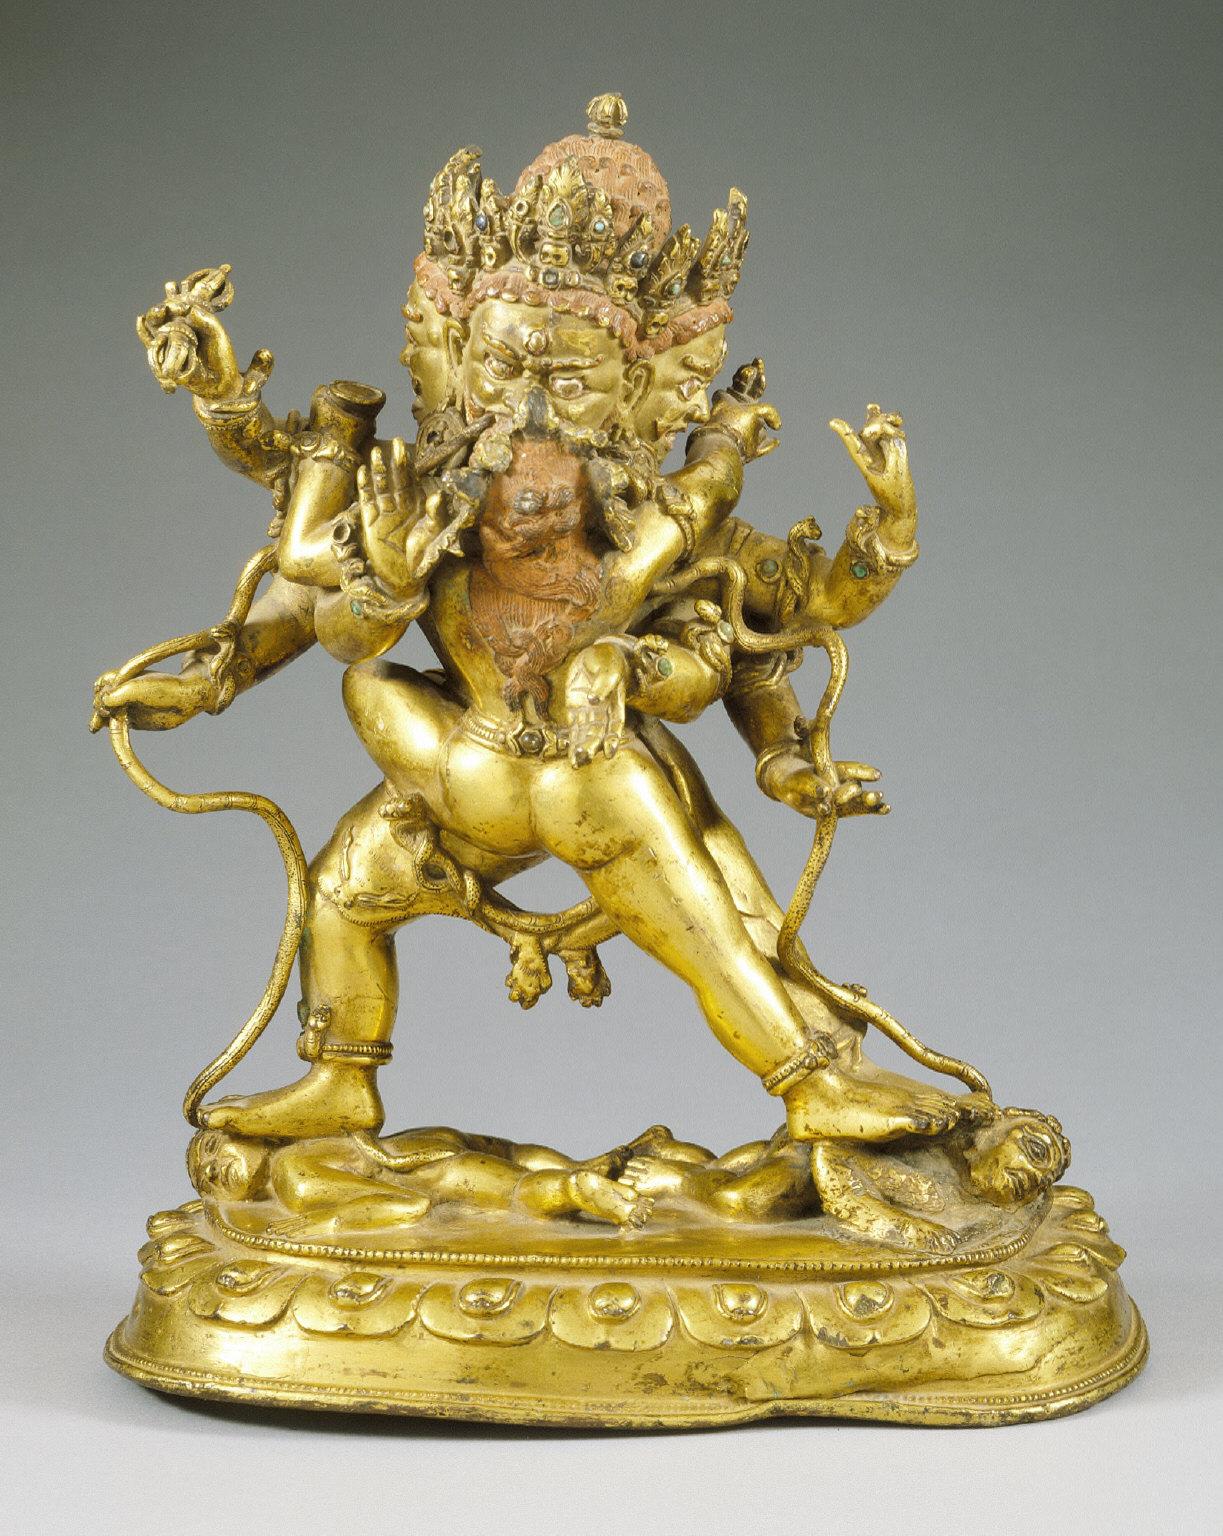 The Boddhisattva Vajrapani (Tibetan: Chana Dorje) and His Consort